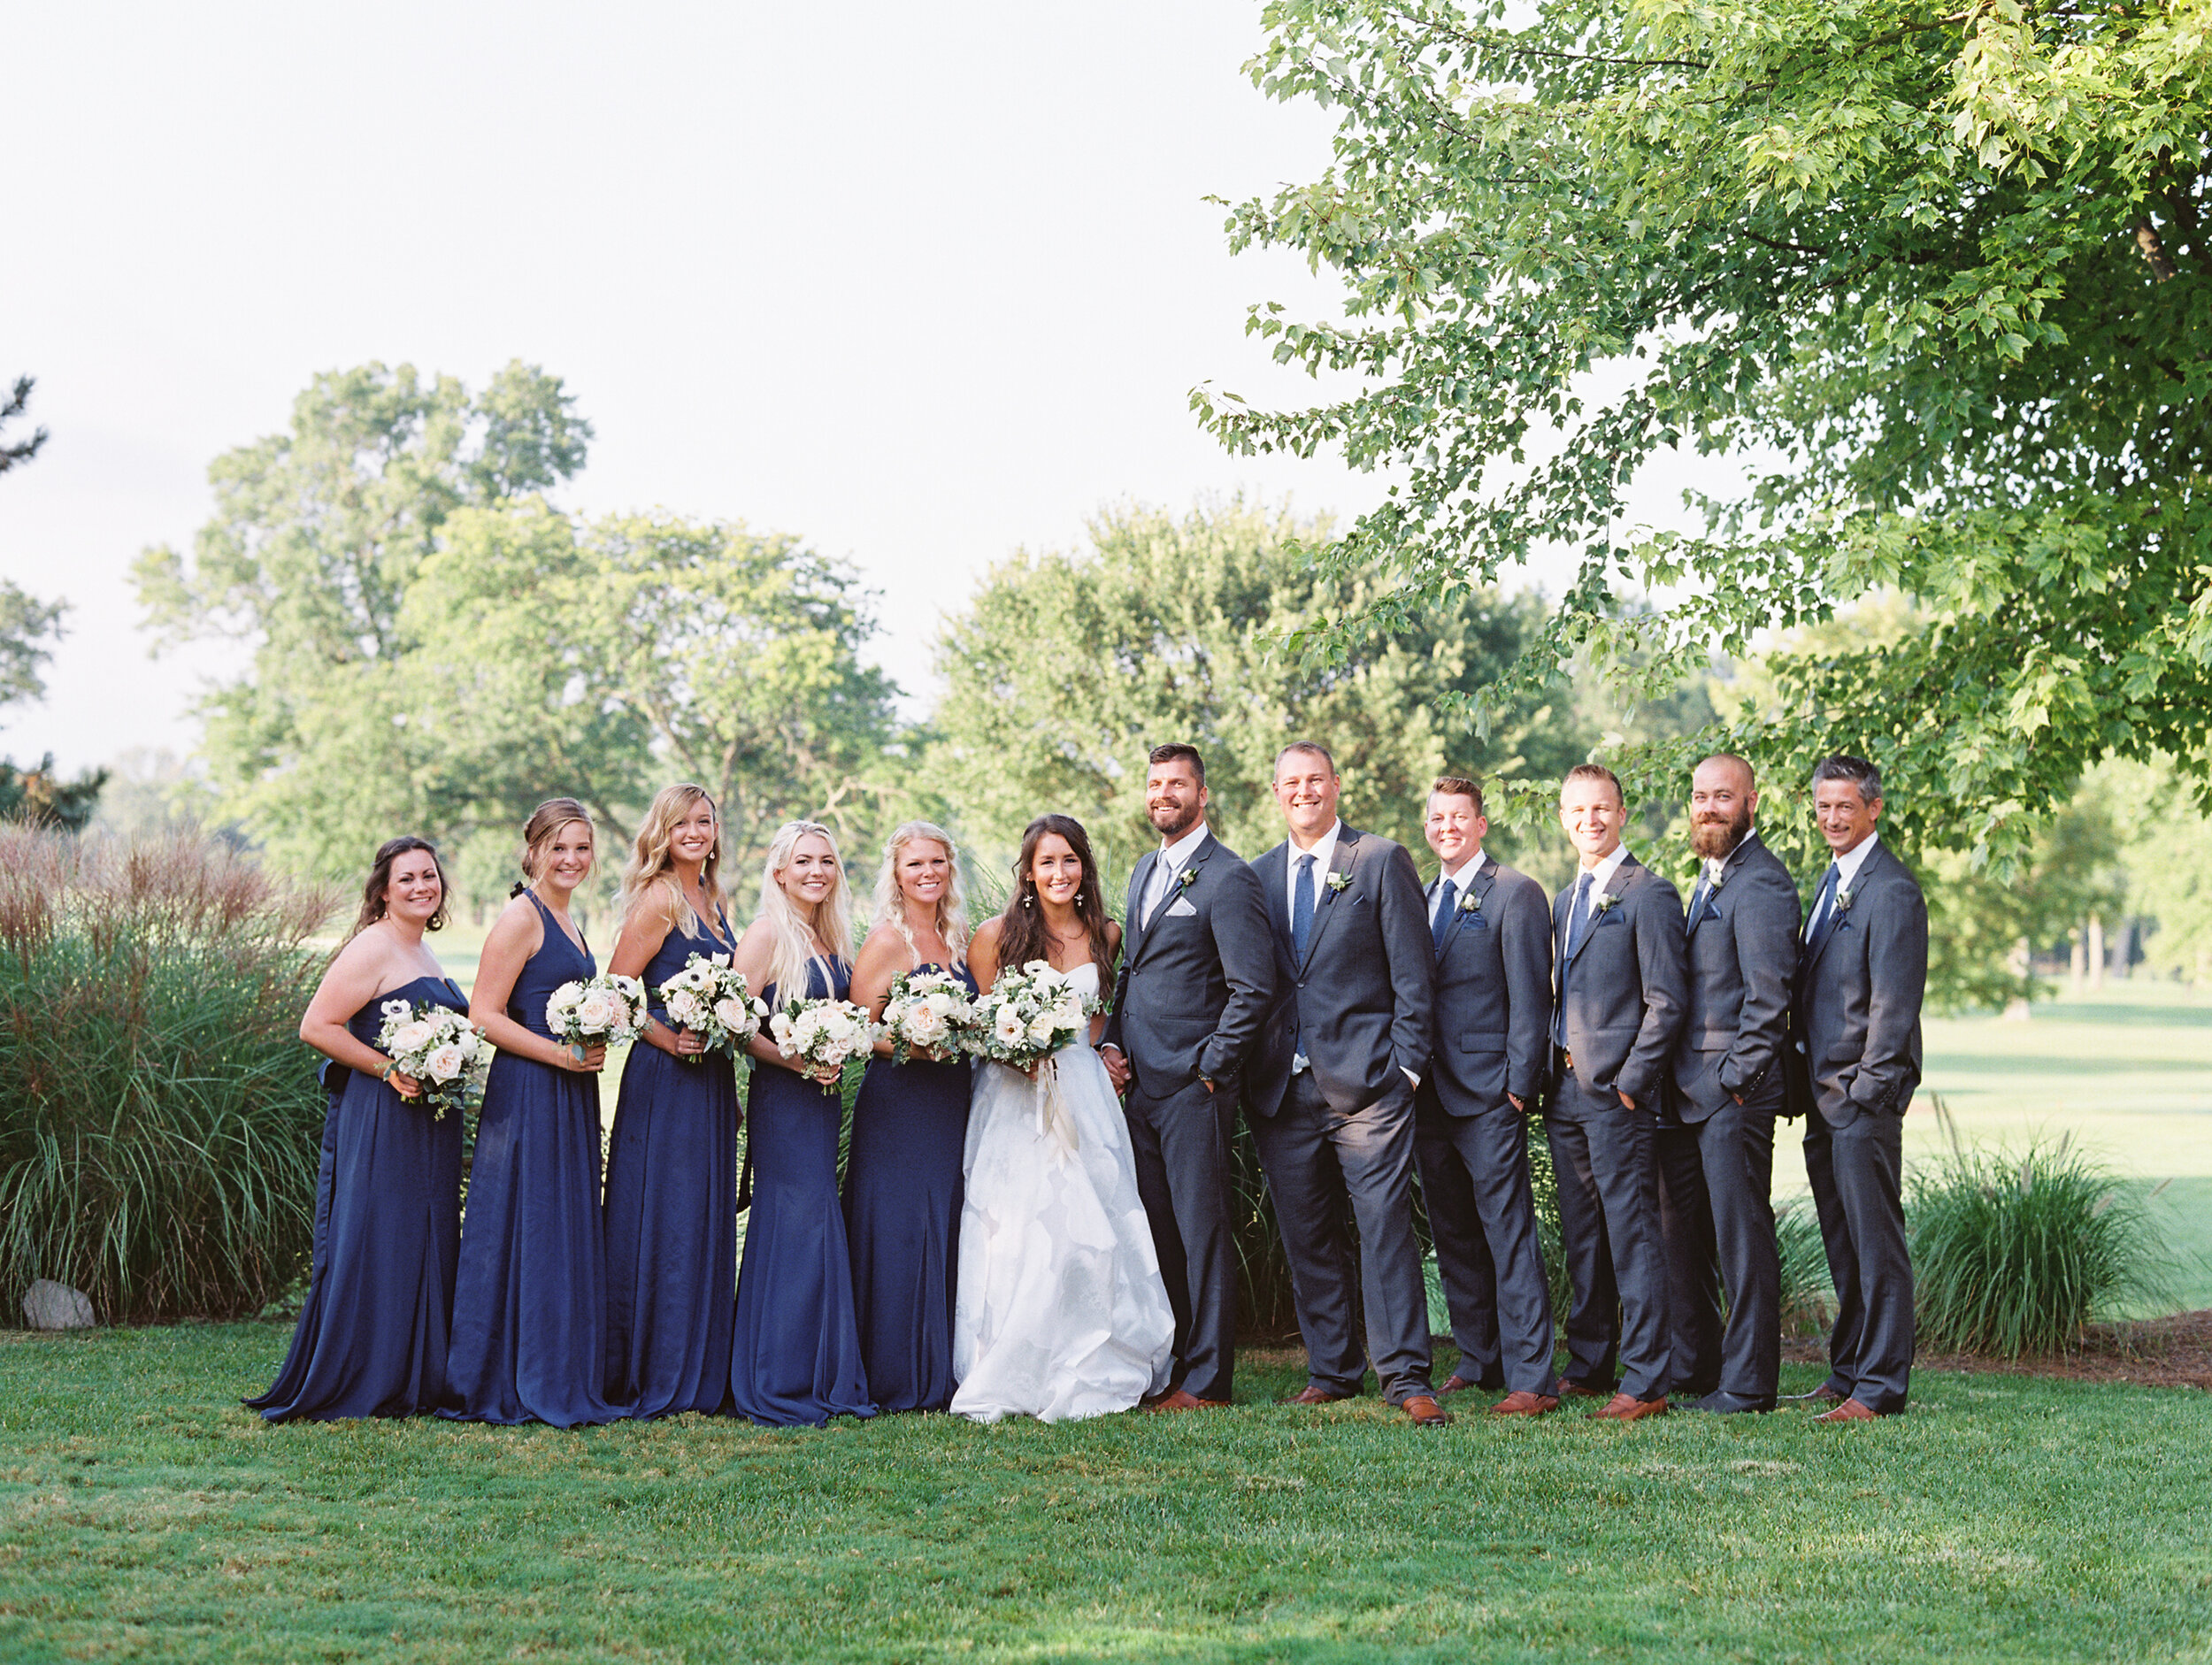 Kuiper+Wedding+Reception+Bridal+Party-123.jpg